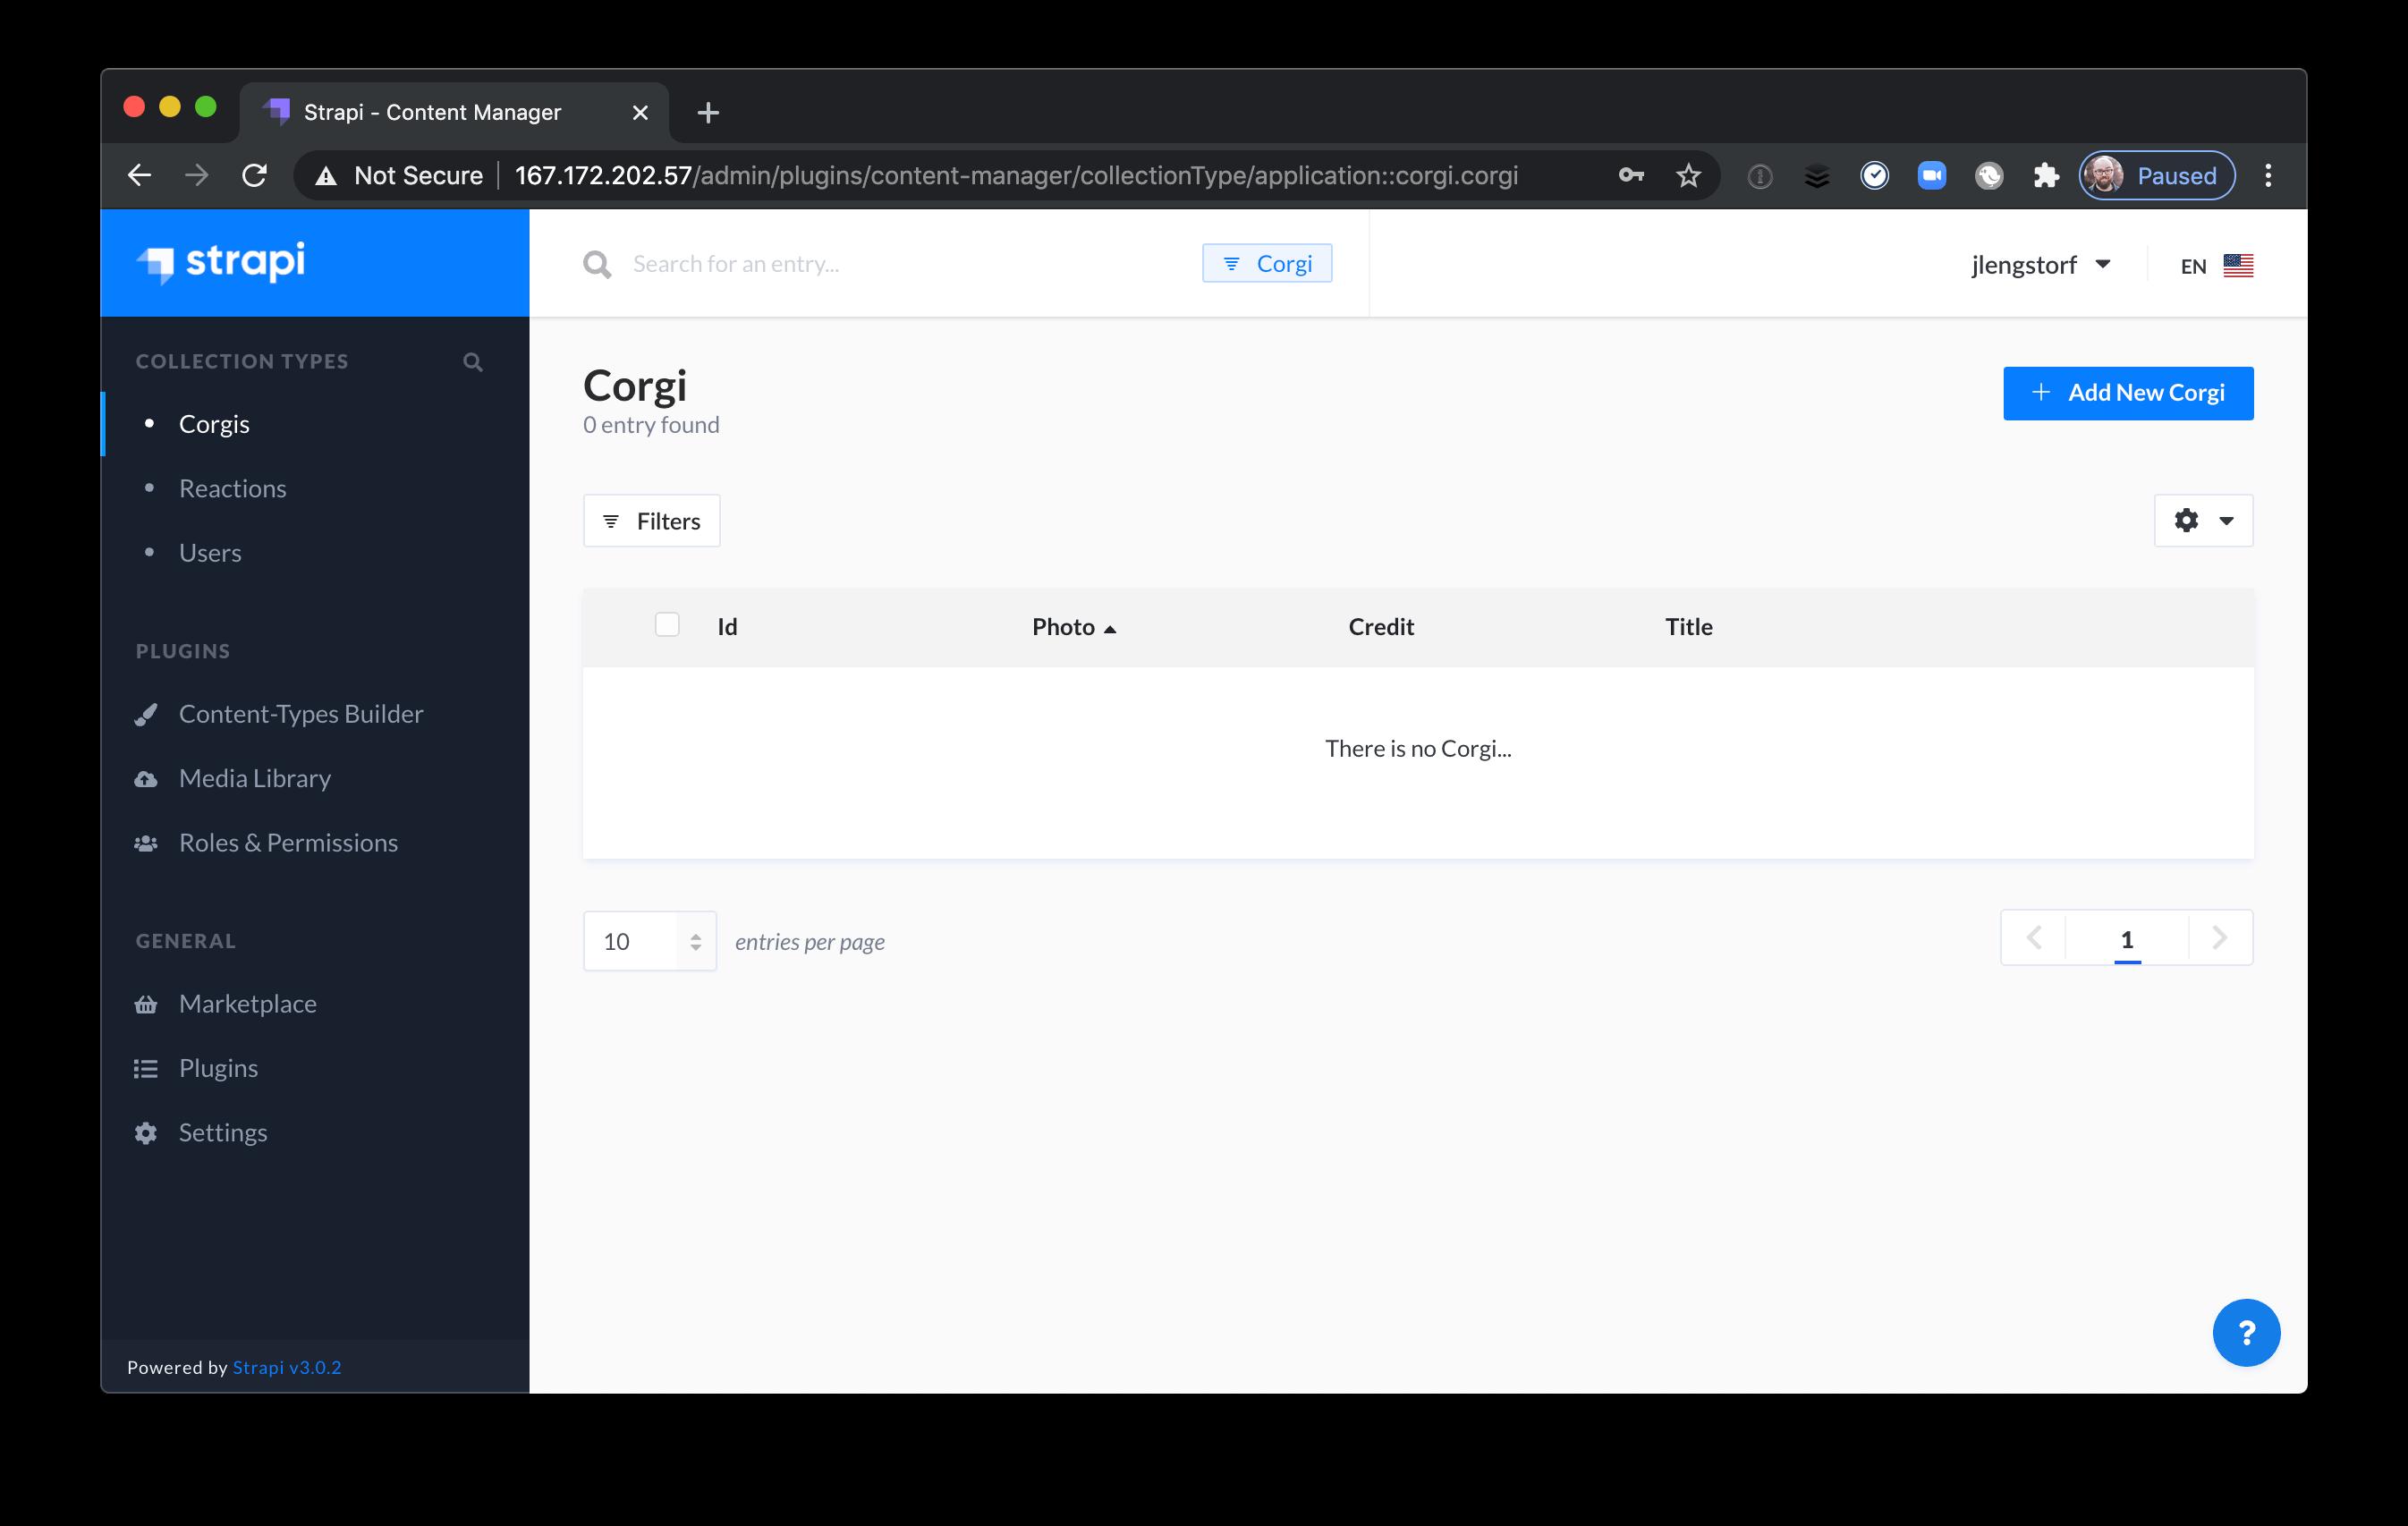 Adding an entry through the Strapi admin UI.